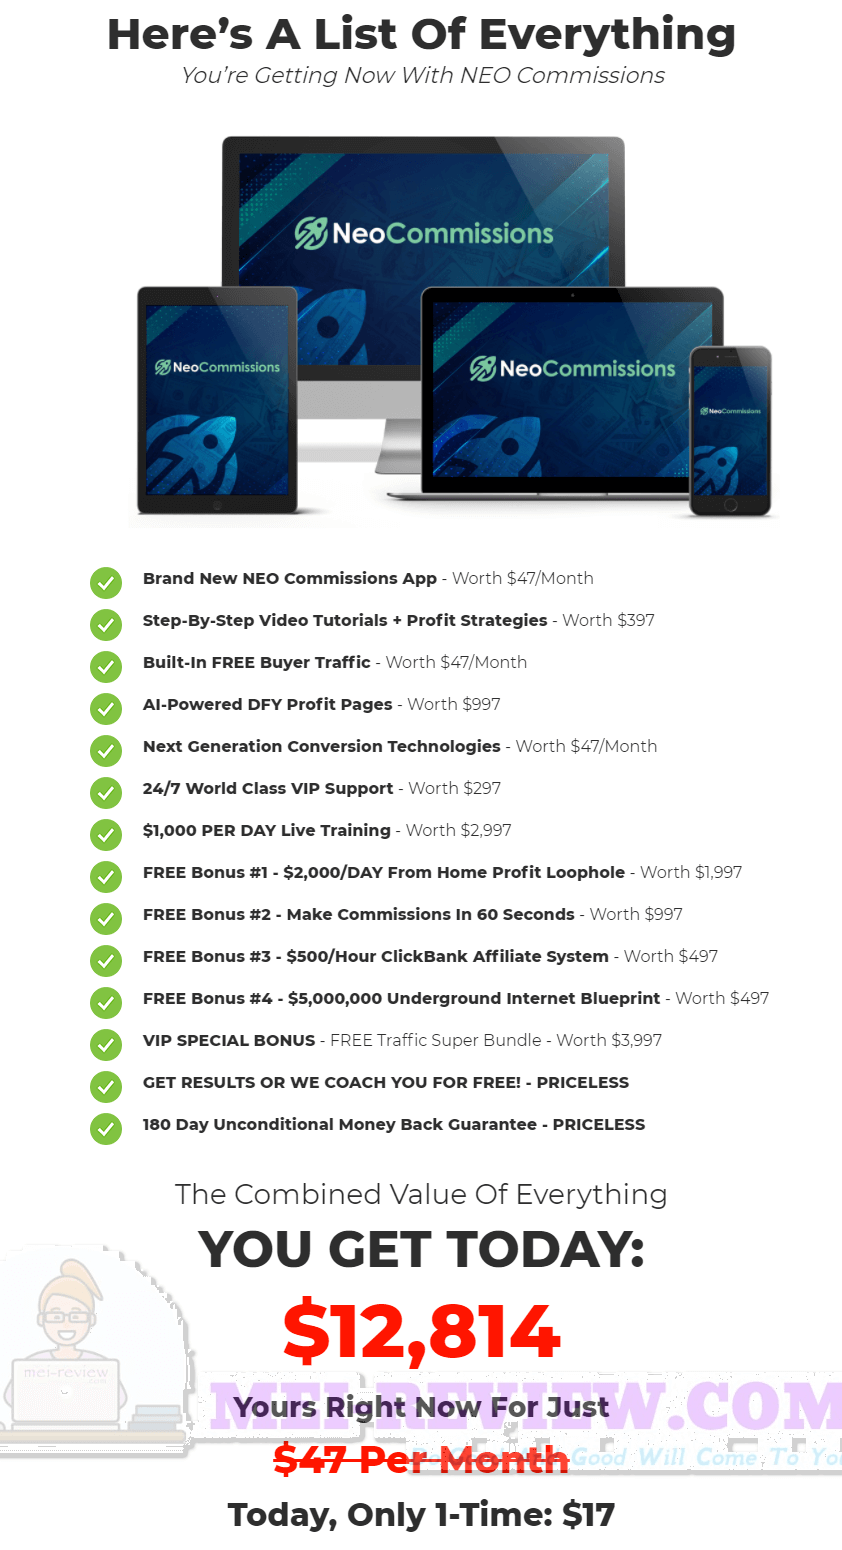 NEO-Commissions-price